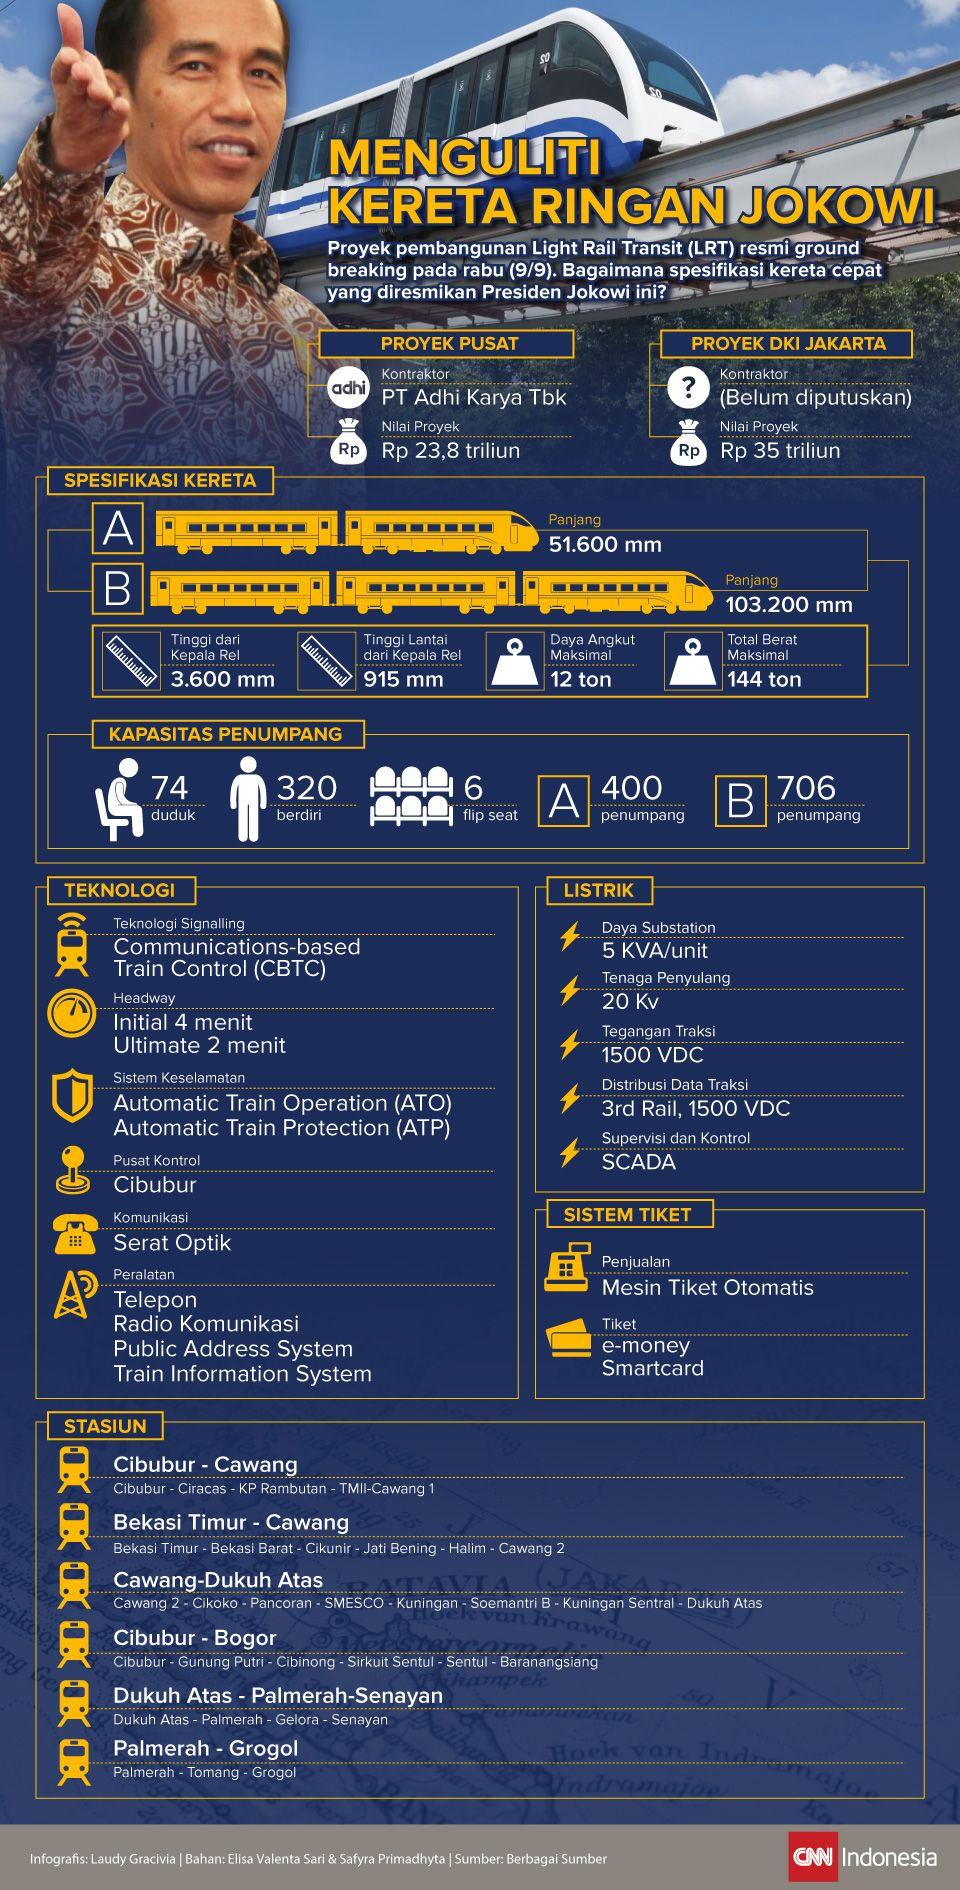 Infografis Kereta Ringan Jokowi